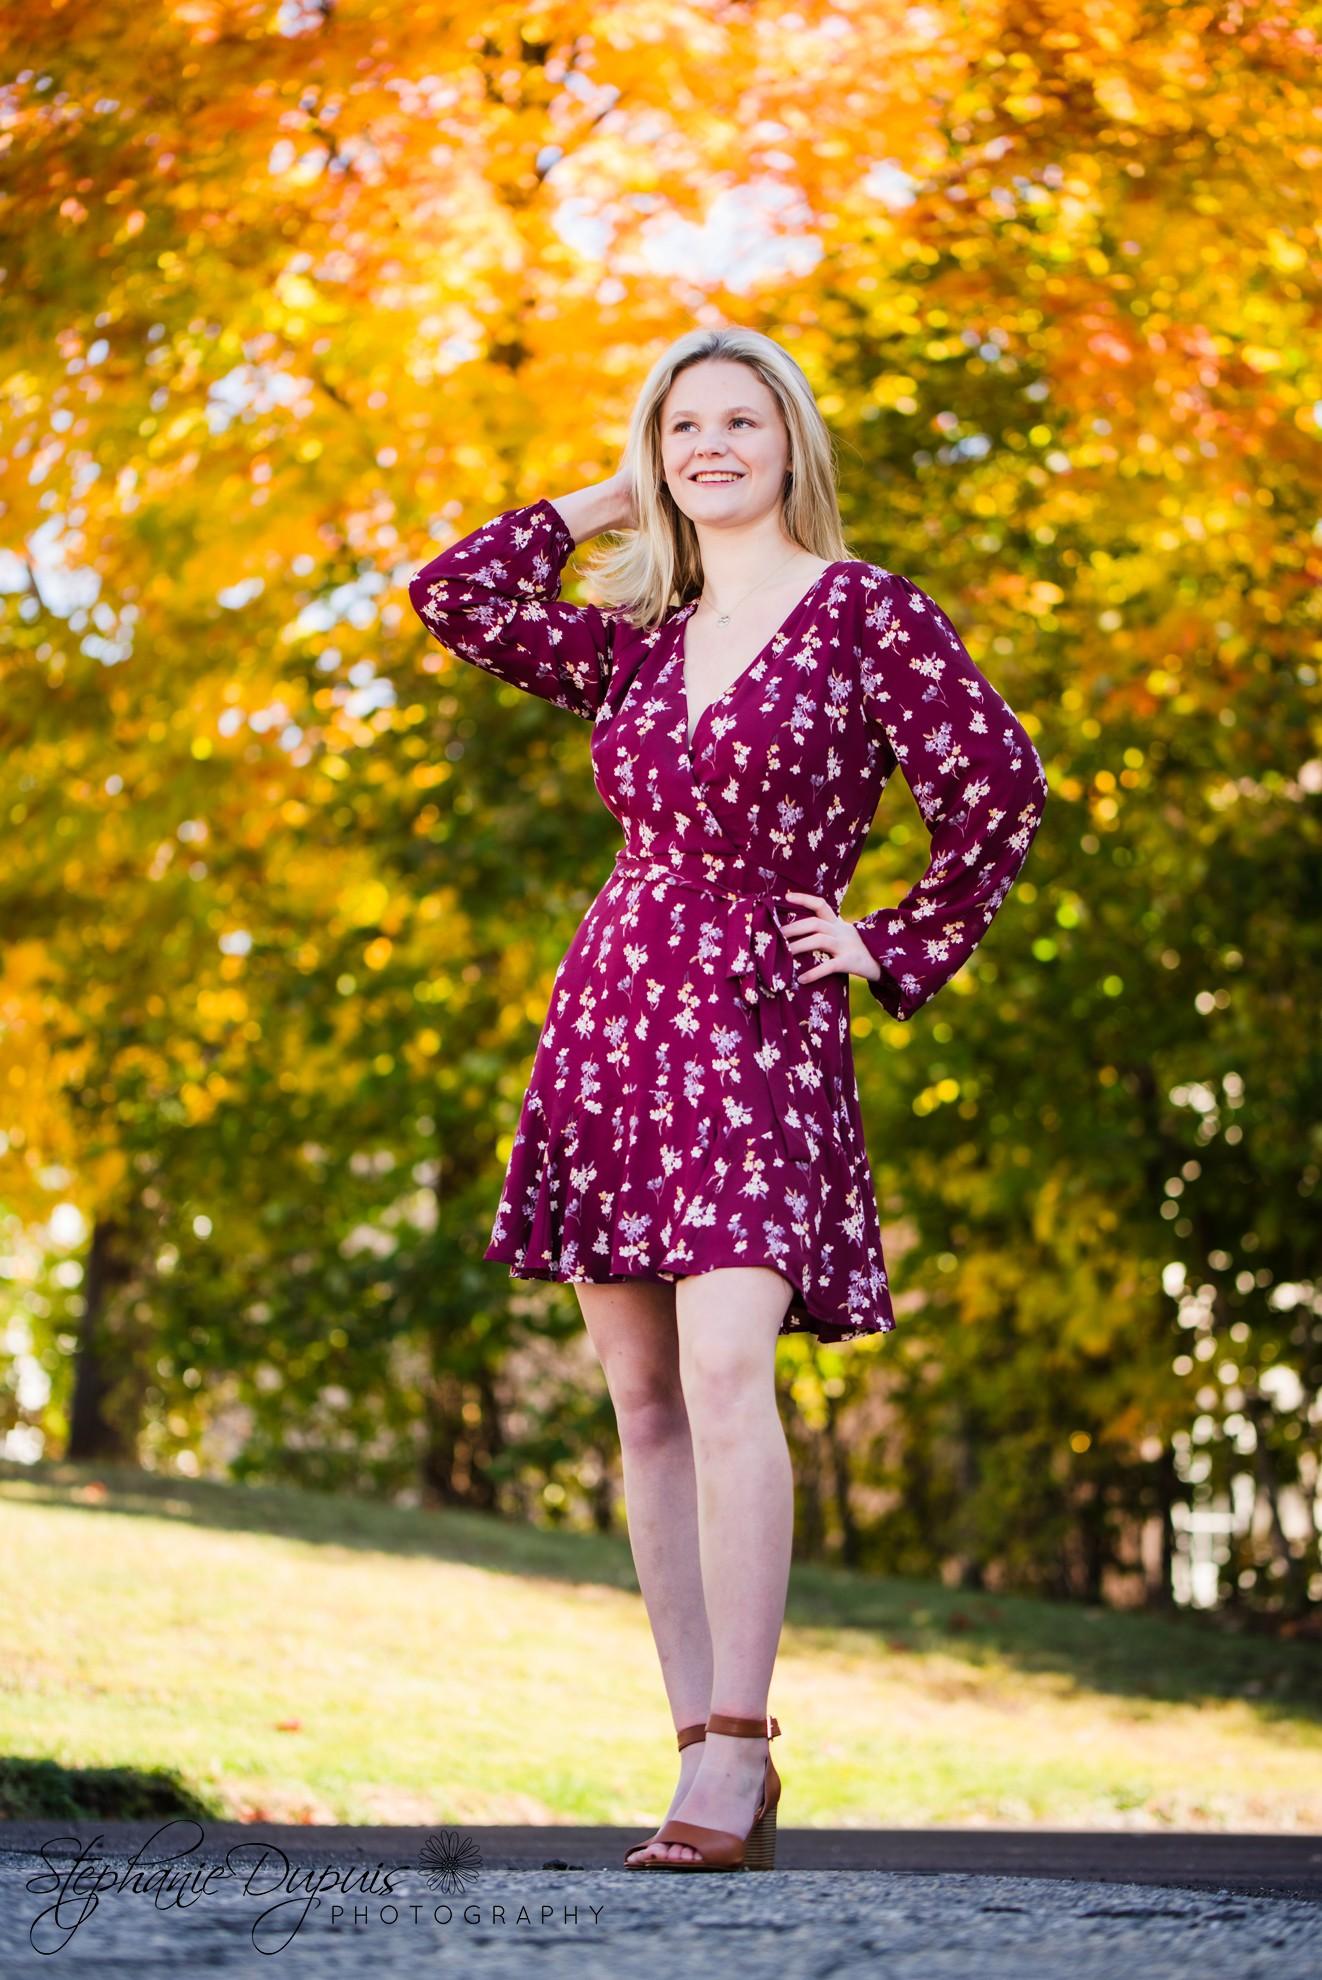 Riendeau 12 2 - Portfolio: Lisa HS Senior Session